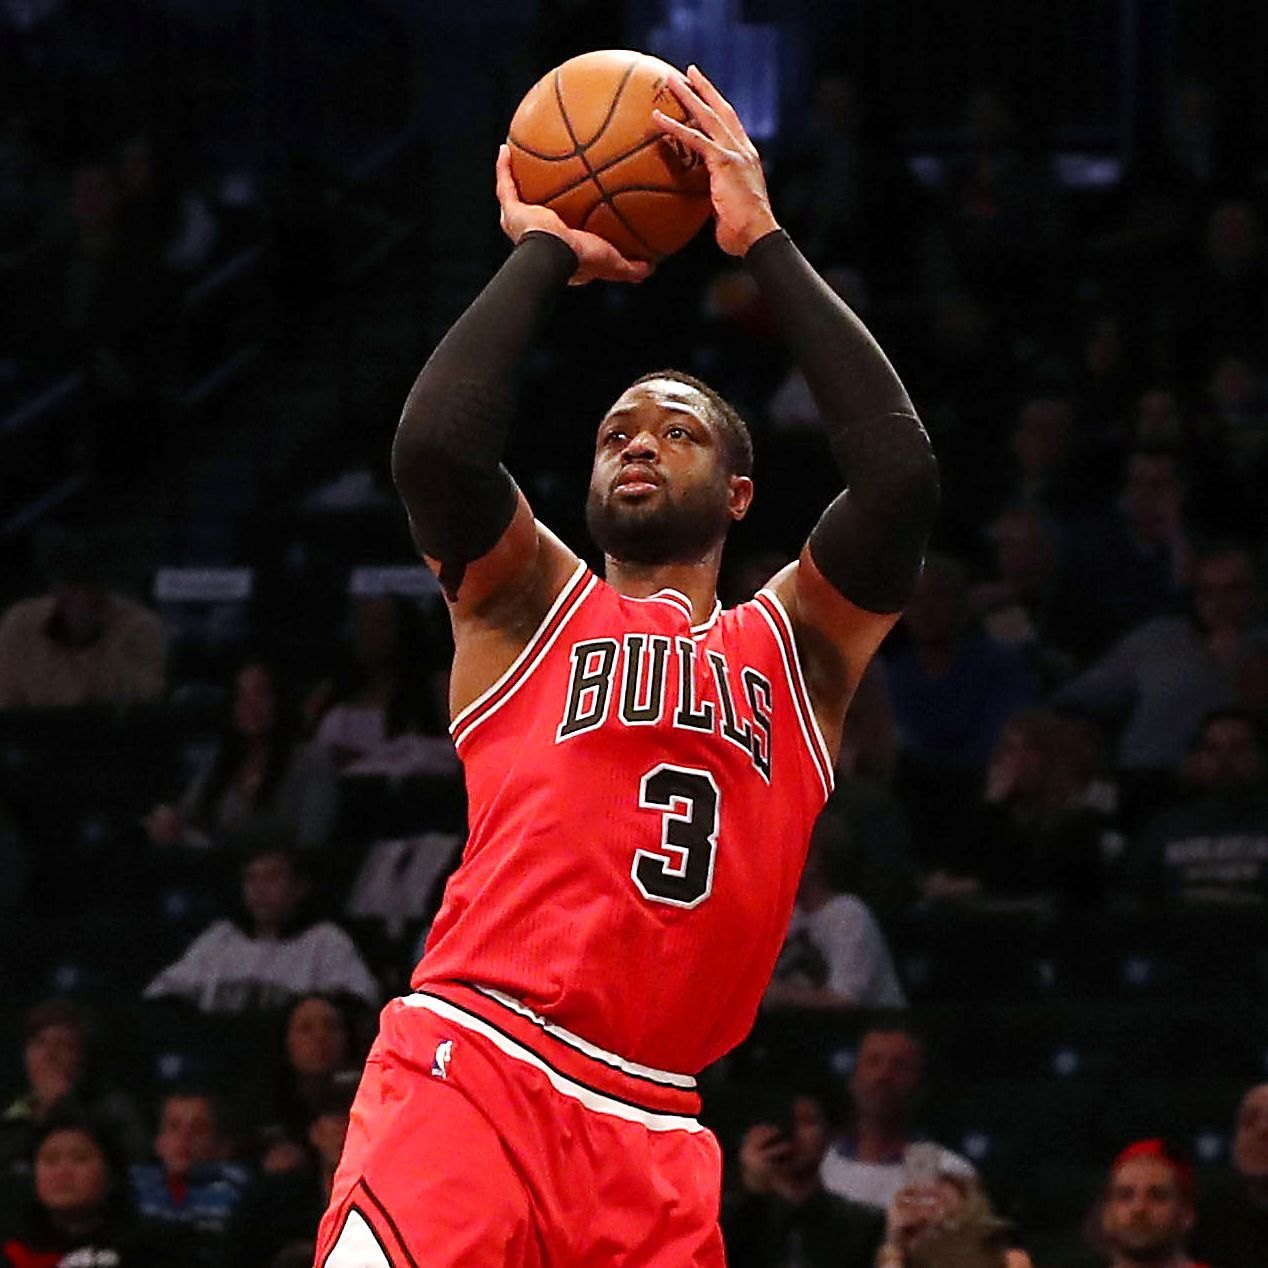 Dwyane Wade Workout: Dwyane Wade, Chicago Bulls Agree On Contract Buyout